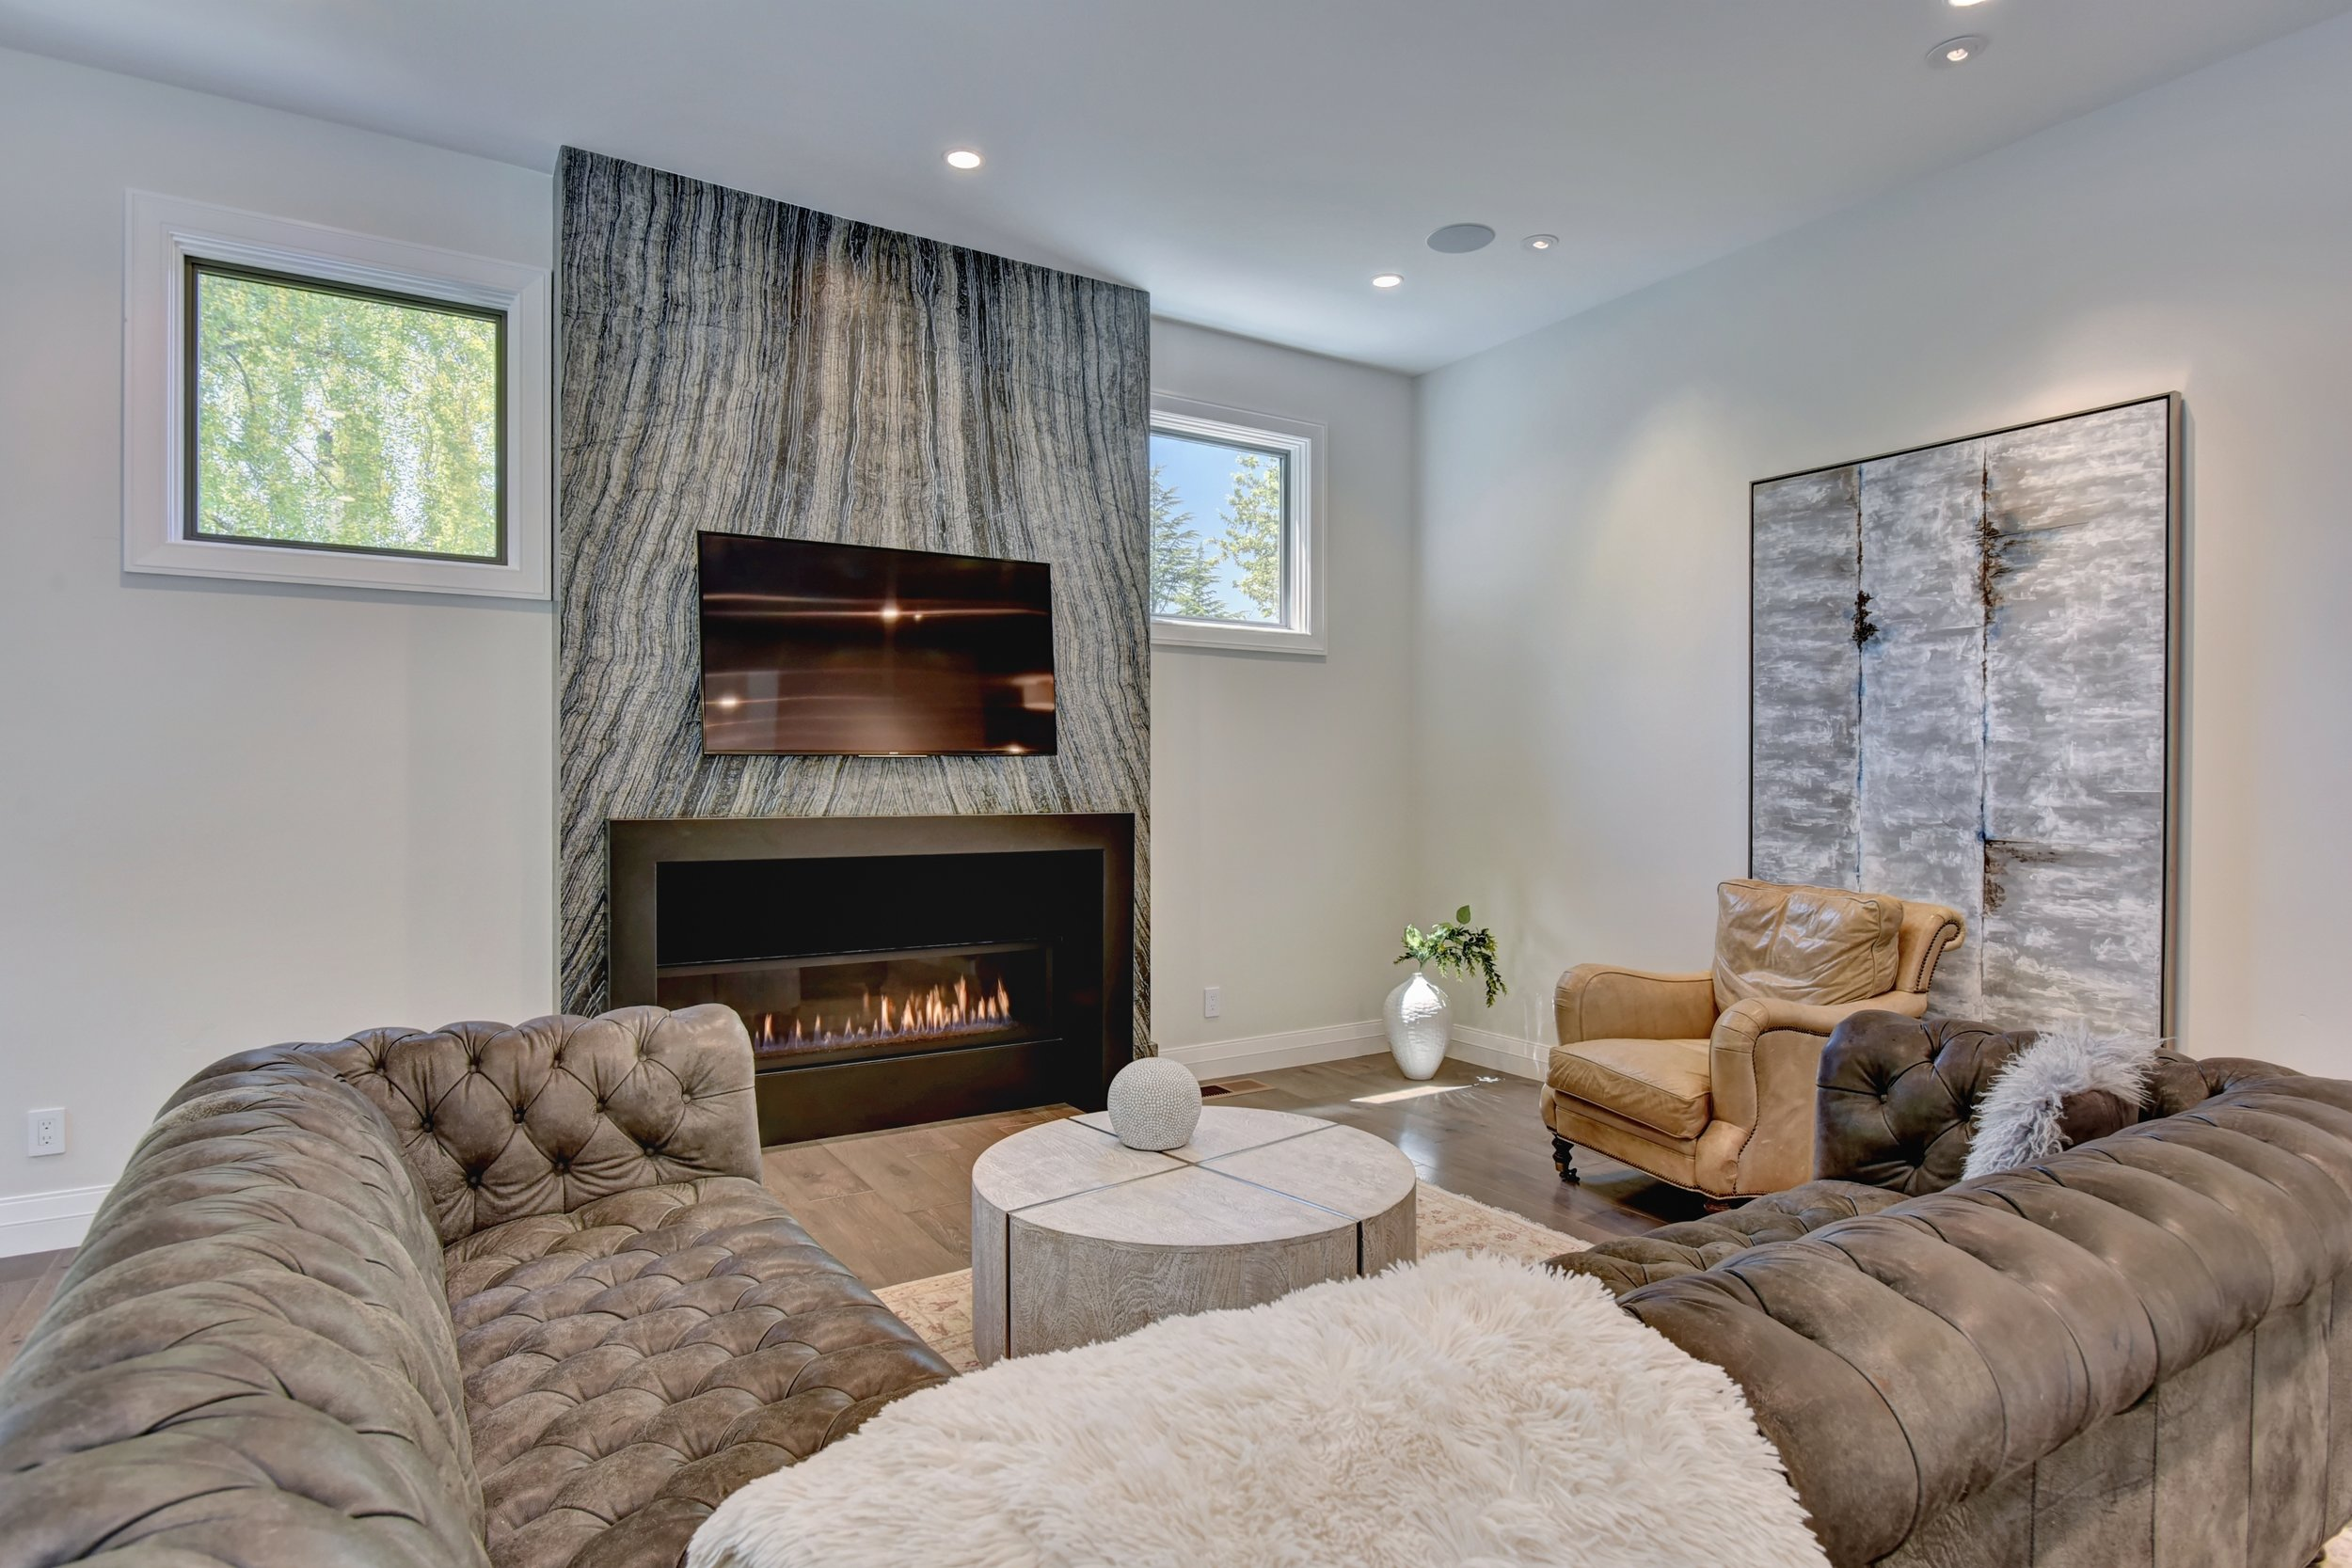 10_fireplace at angle.jpg